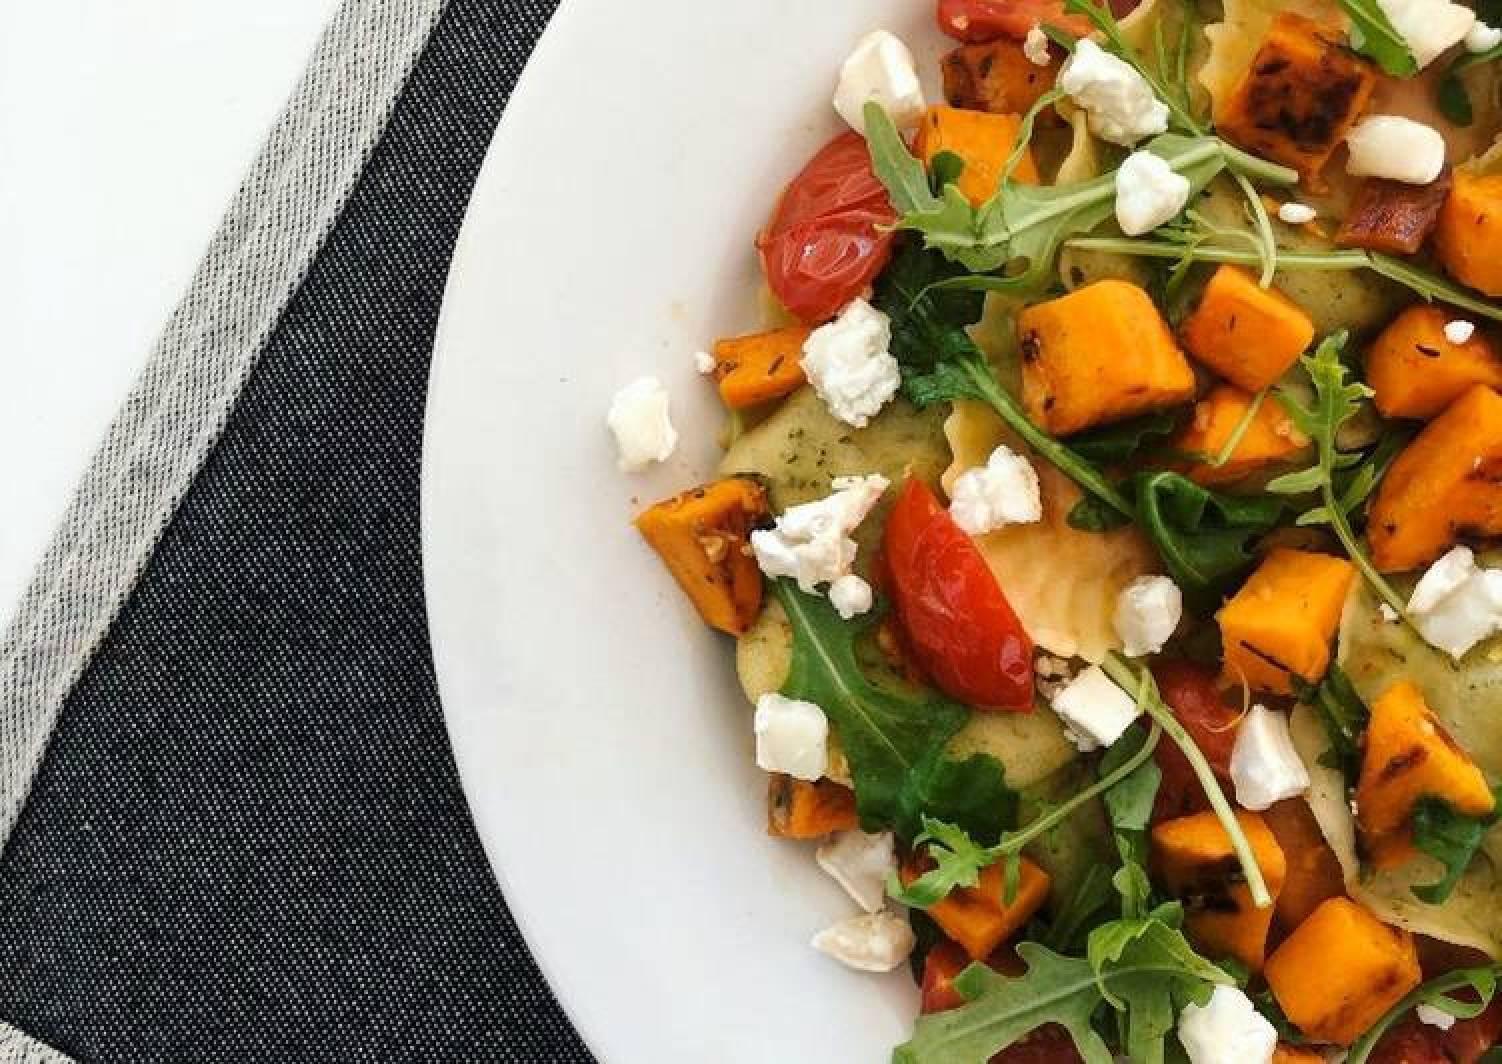 Sweet Potato Ravioli with Cherry Tomatoes, Goat Cheese and Arugula